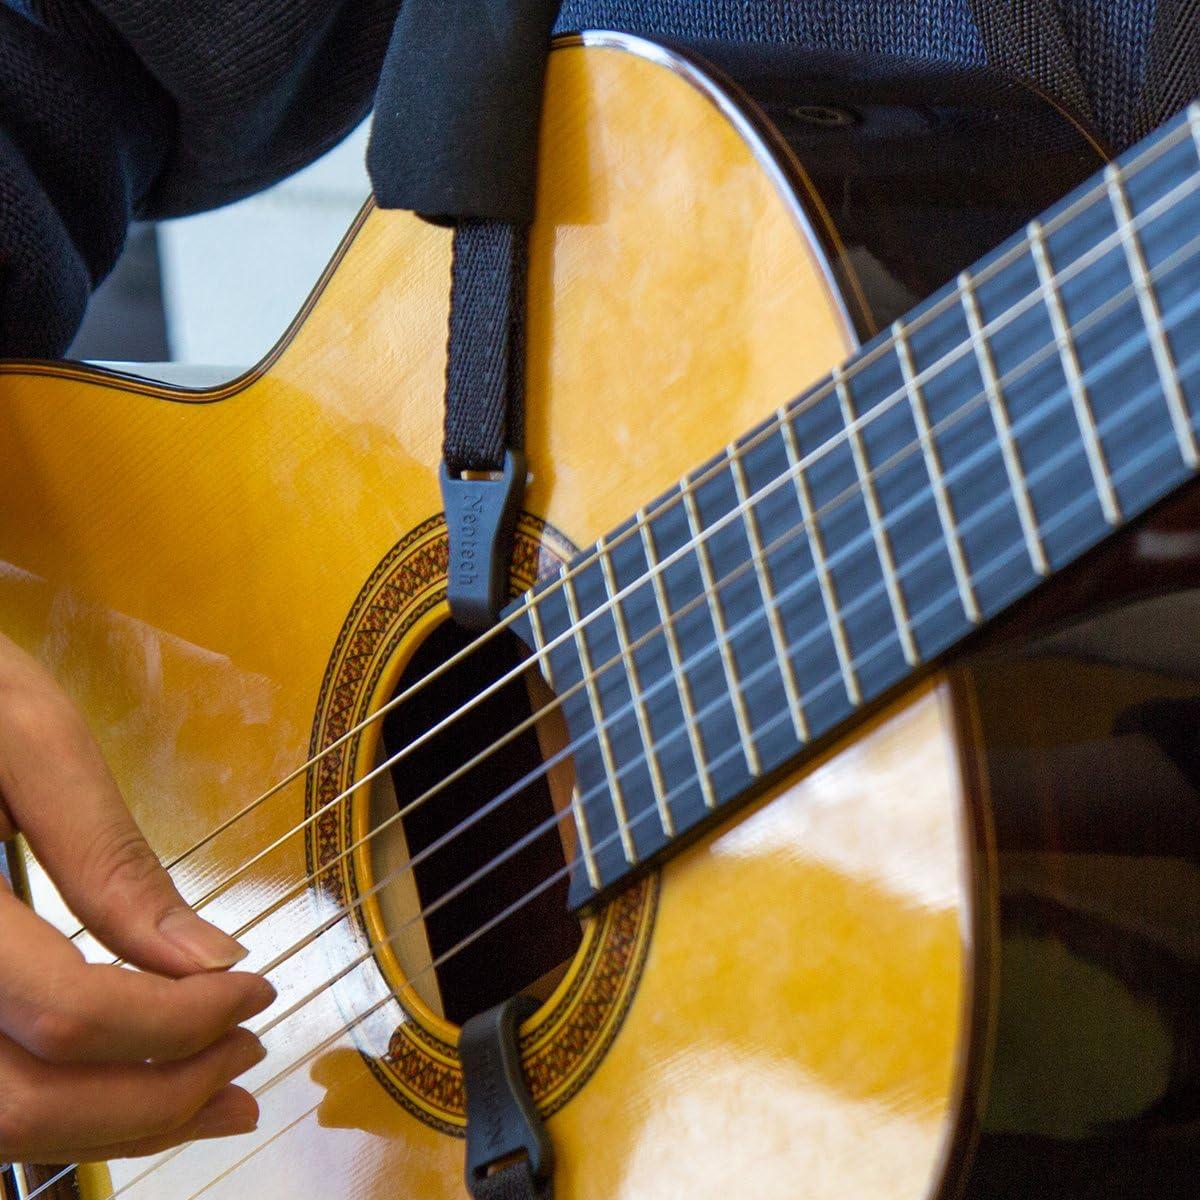 Neotech acoustic guitar strap